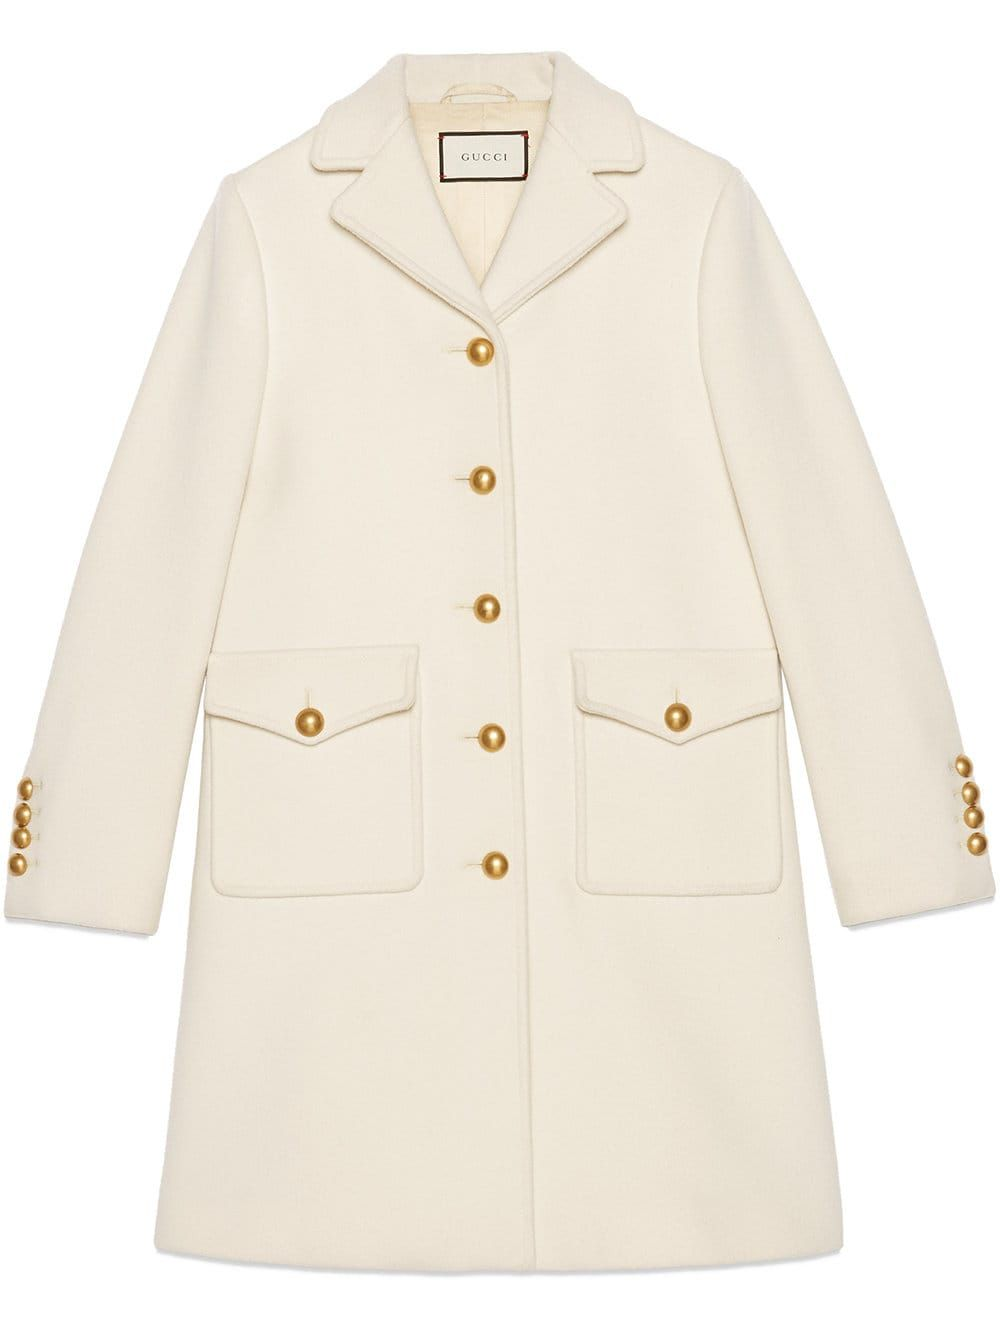 Gucci Wool Coat With Double G Farfetch In 2021 Coats For Women Wool Coat Coat Design [ 1334 x 1000 Pixel ]